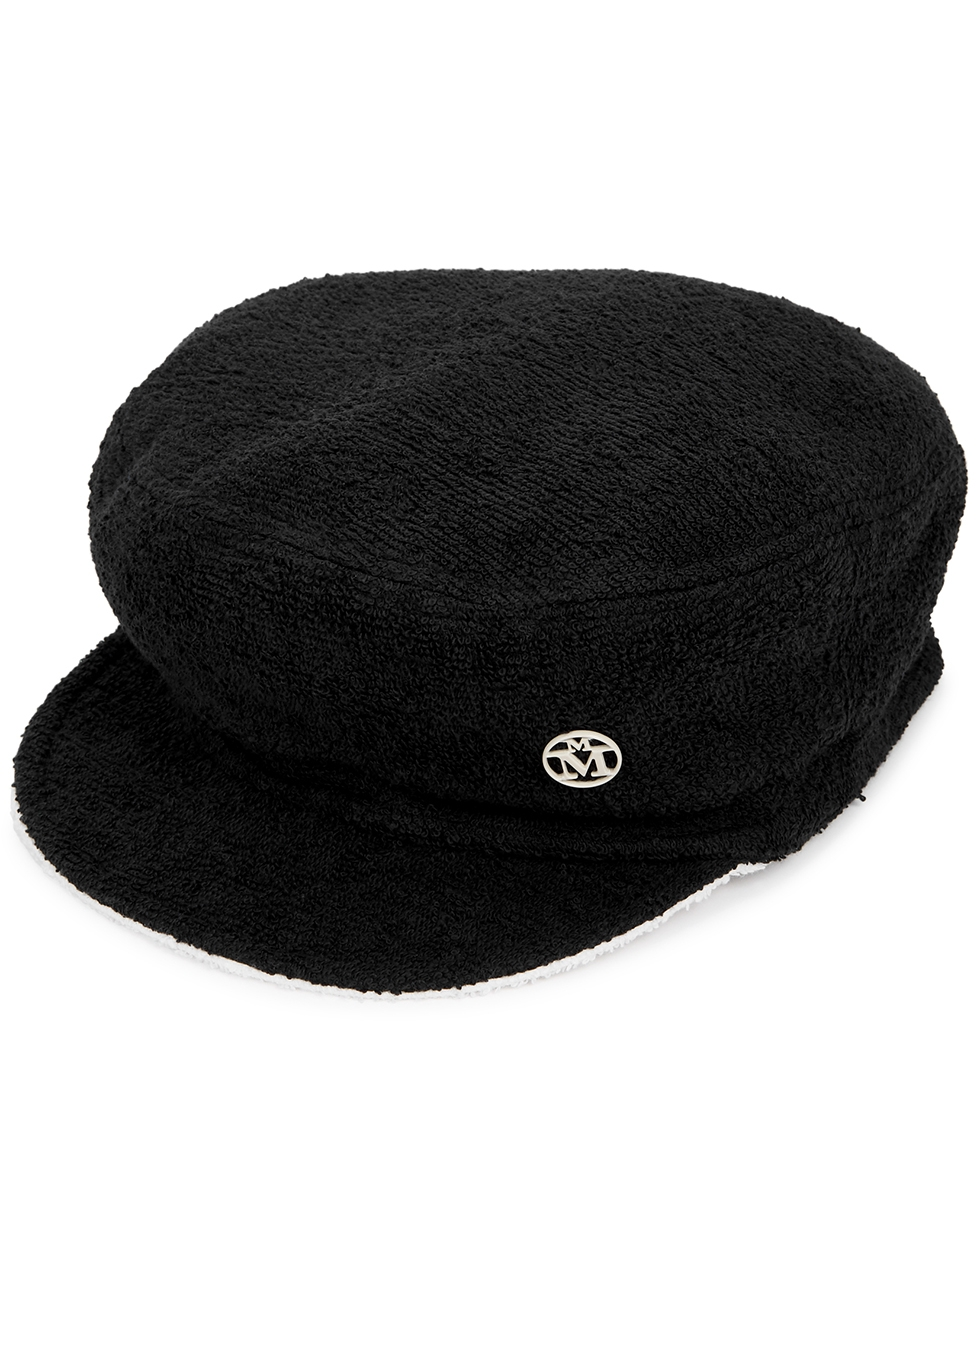 New Abby reversible terry cap